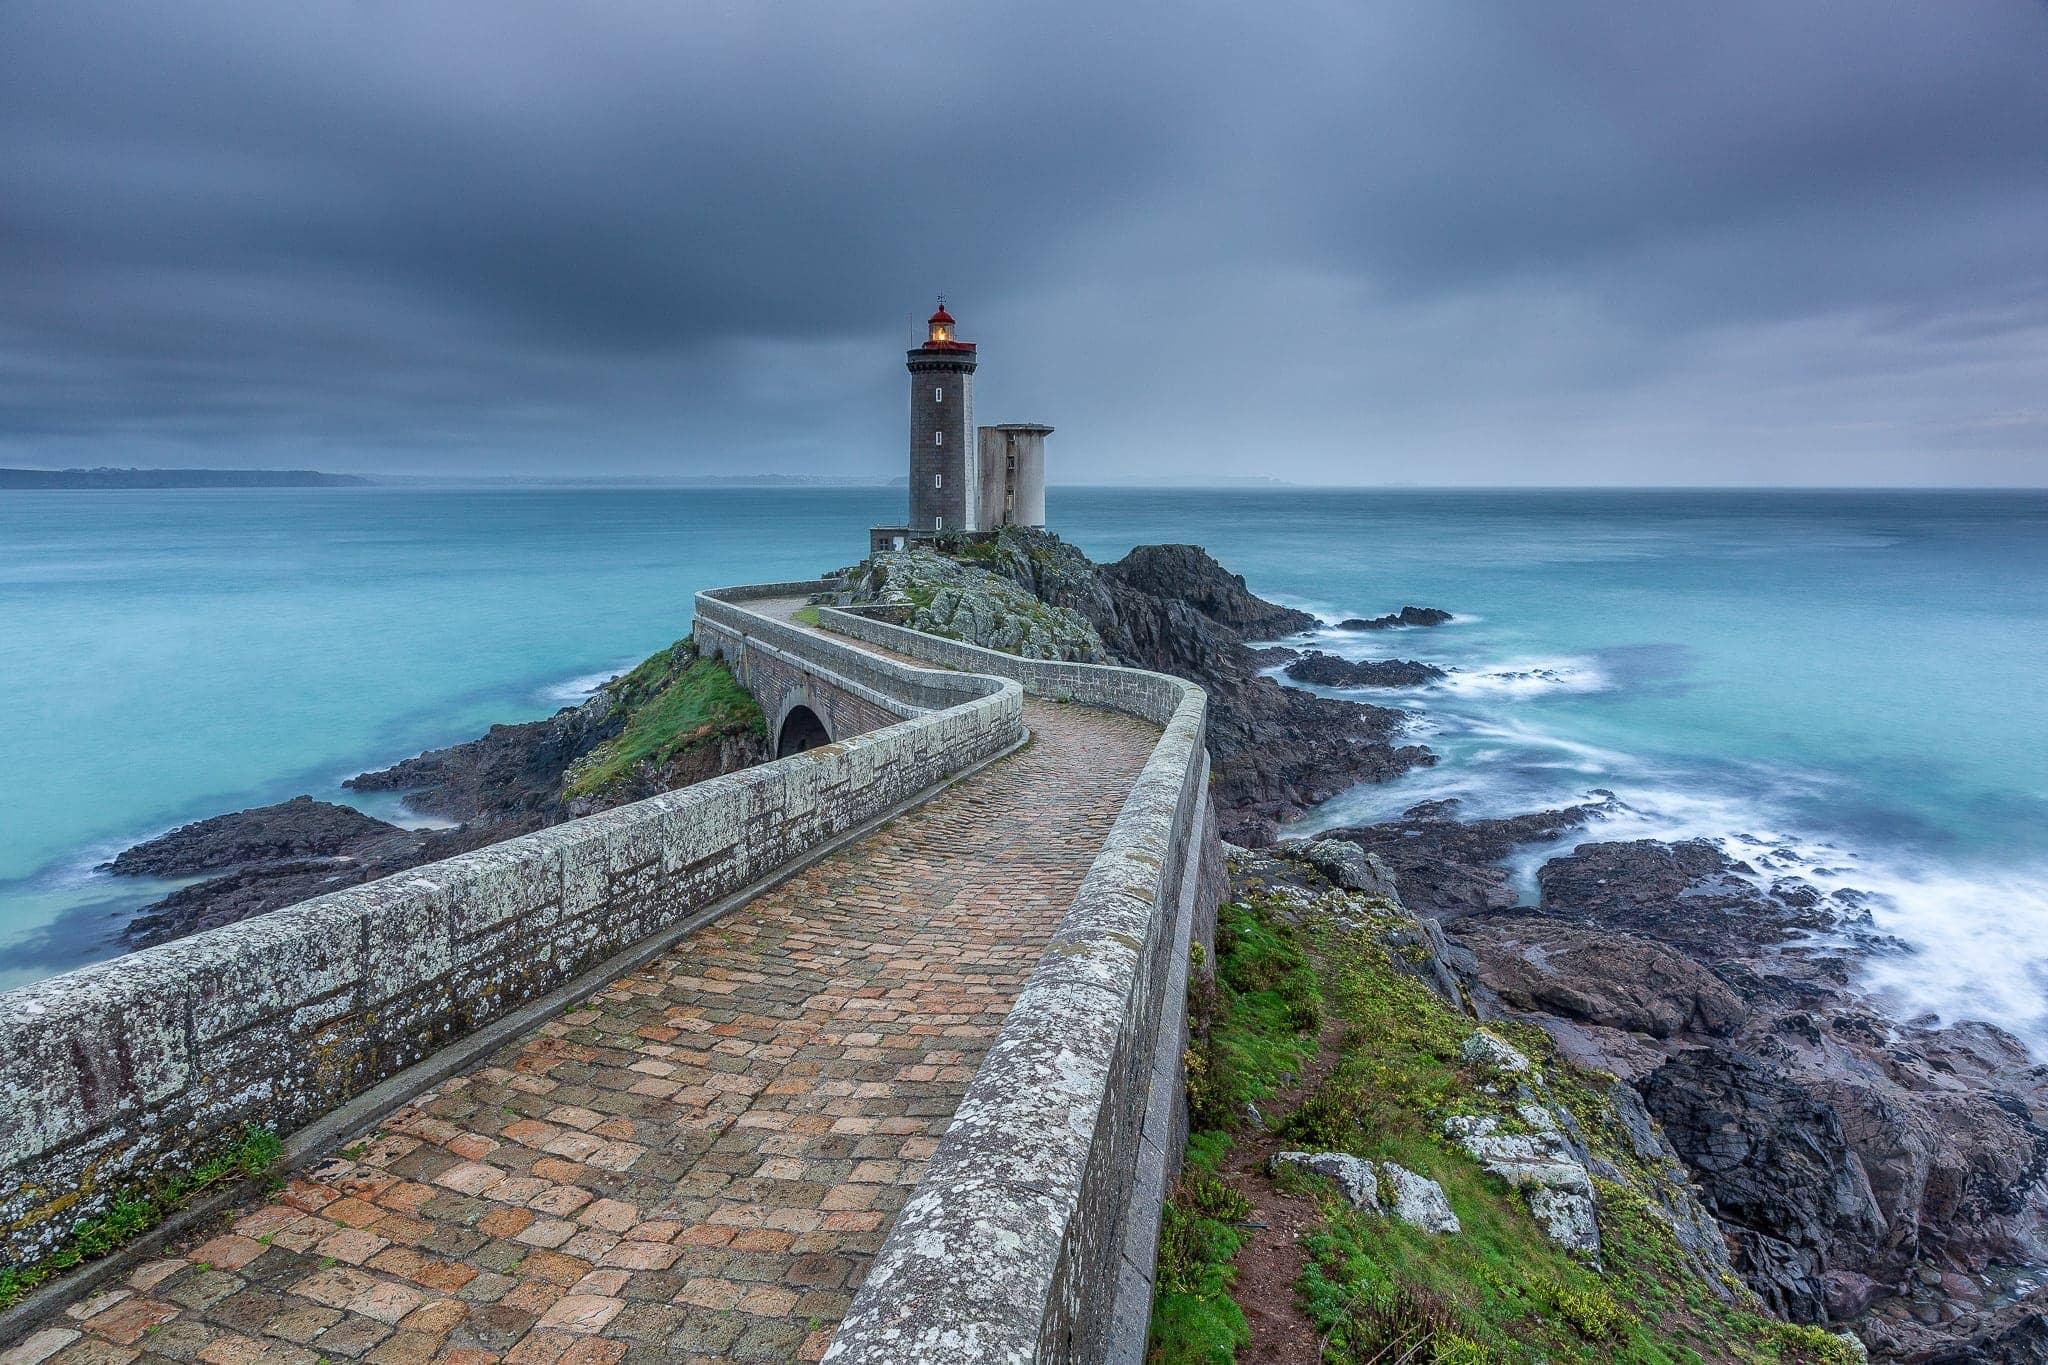 Francesco Gola Seascape Landscape Photography Petit Minou Storm Lighthouse Brittany Bretagne France Long Exposure